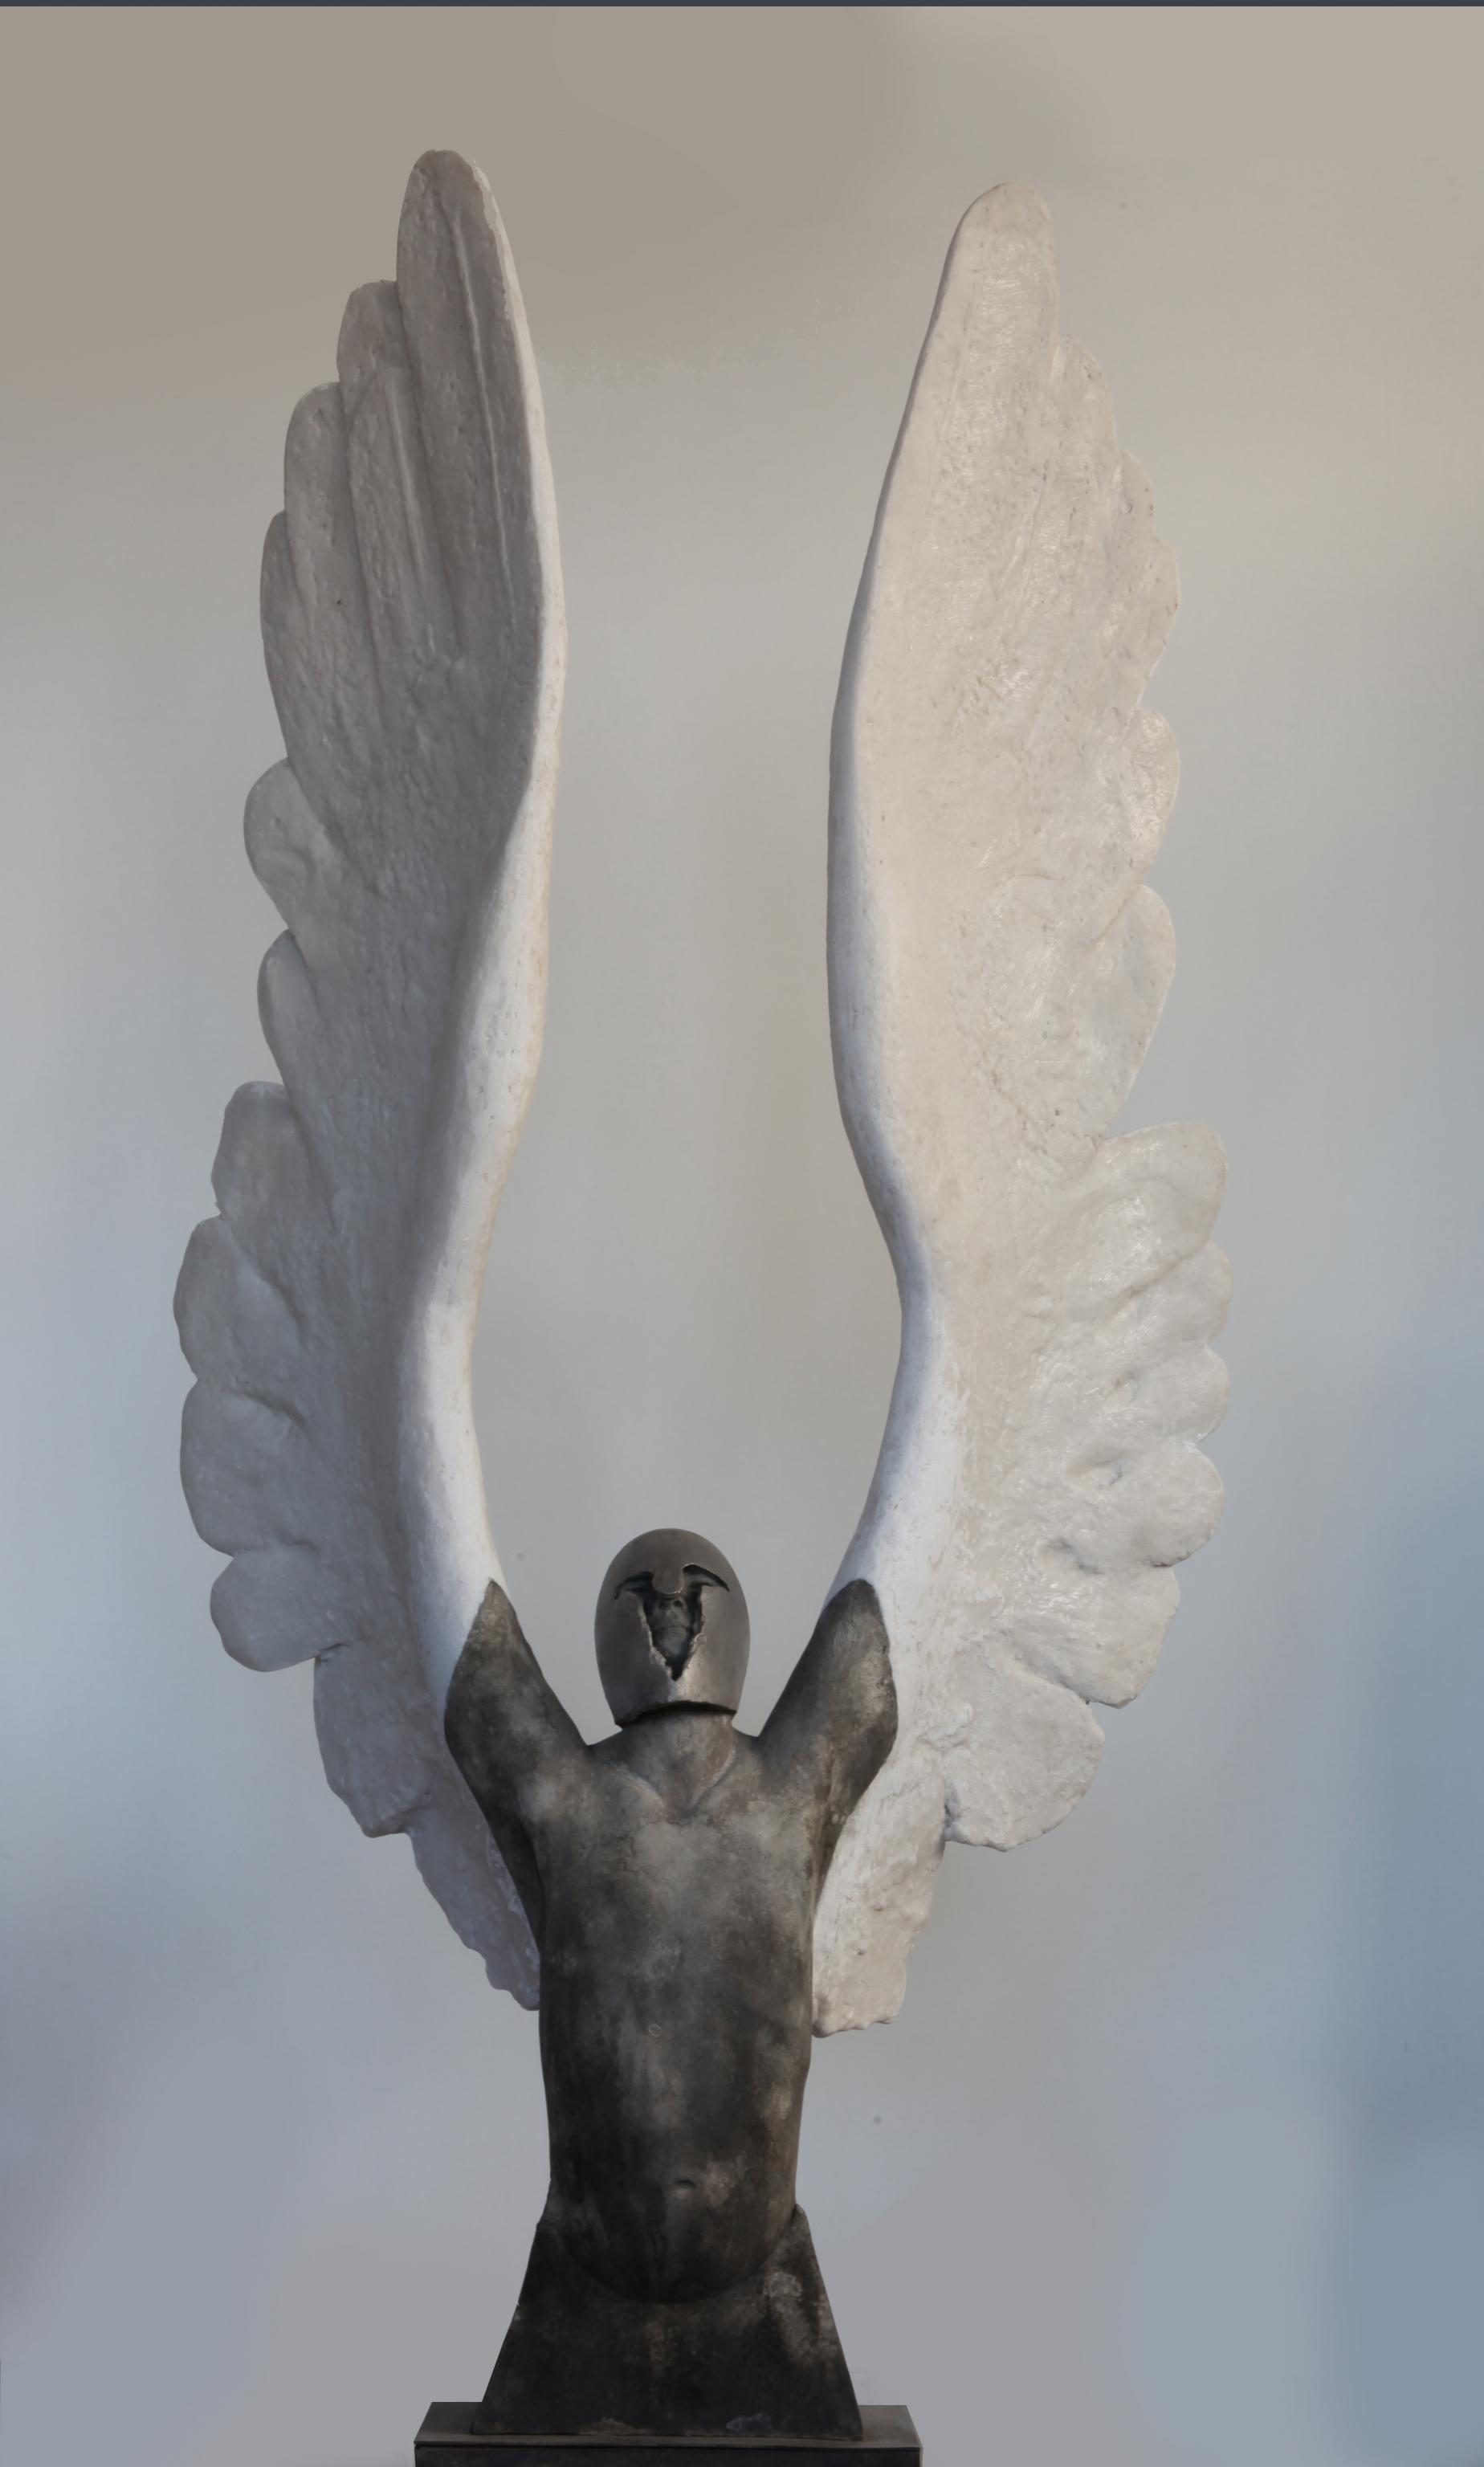 <strong> Jesús Curiá</strong> ÍCARUS - 35 x 135 x 65 cm - Bronce y piedra artificial. Ed 10